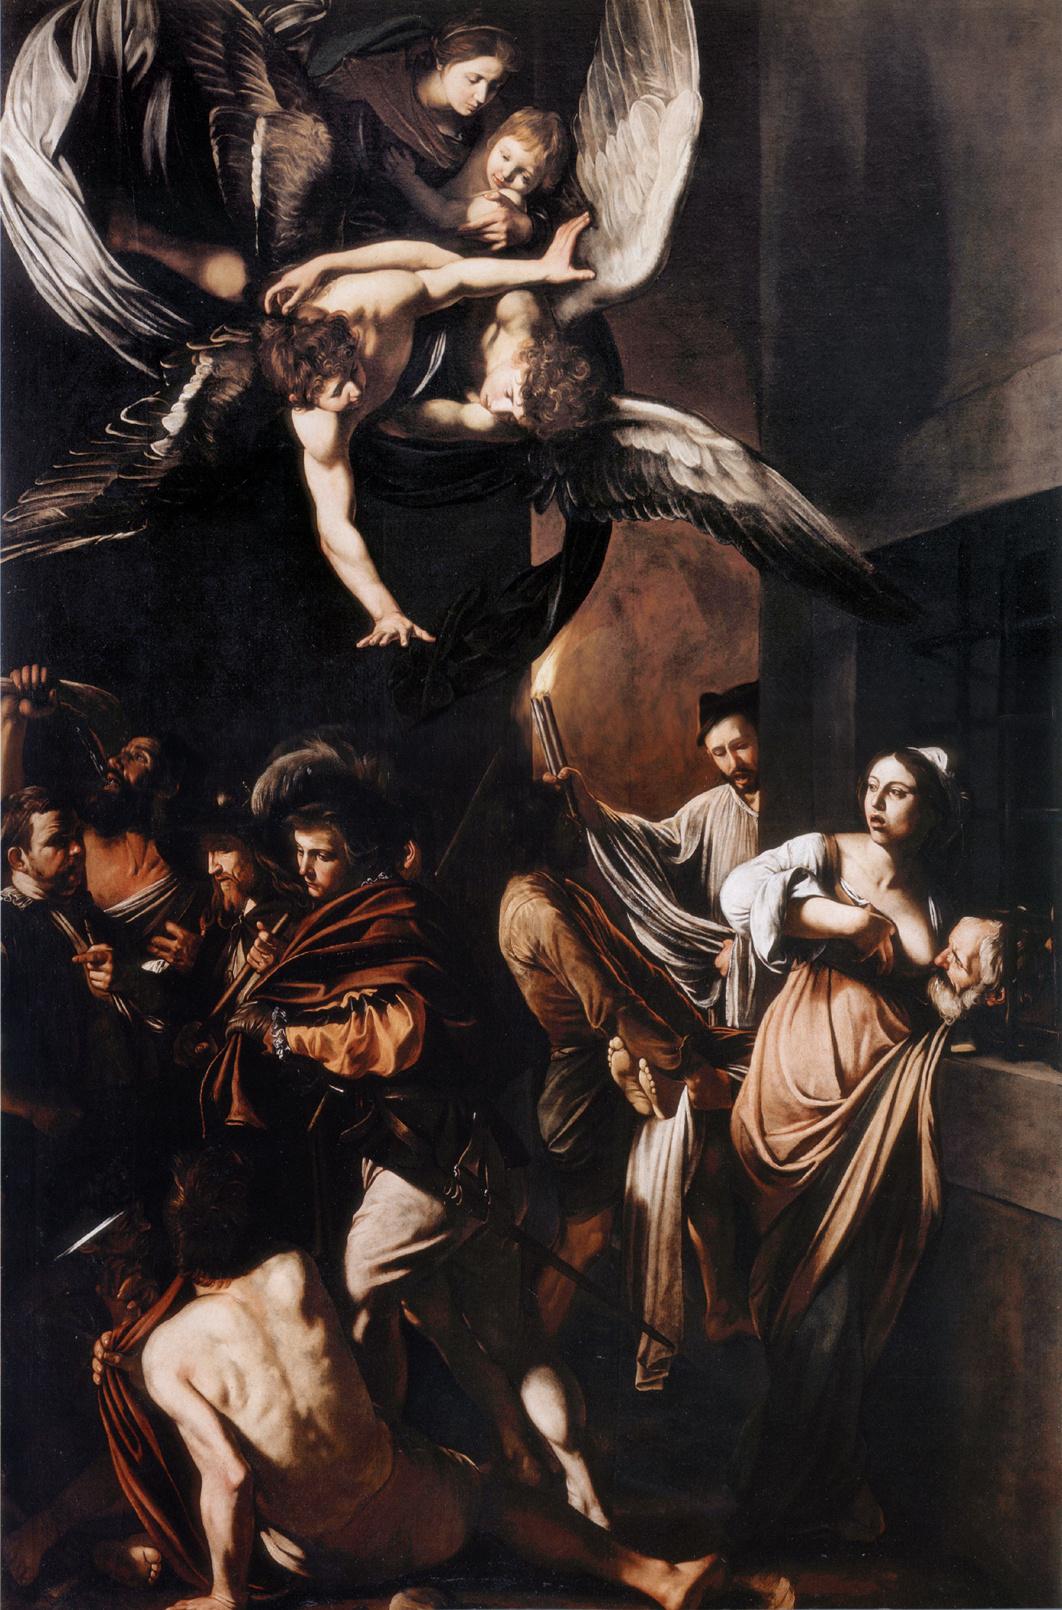 Michelangelo Merisi de Caravaggio. The Seven Acts of Mercy